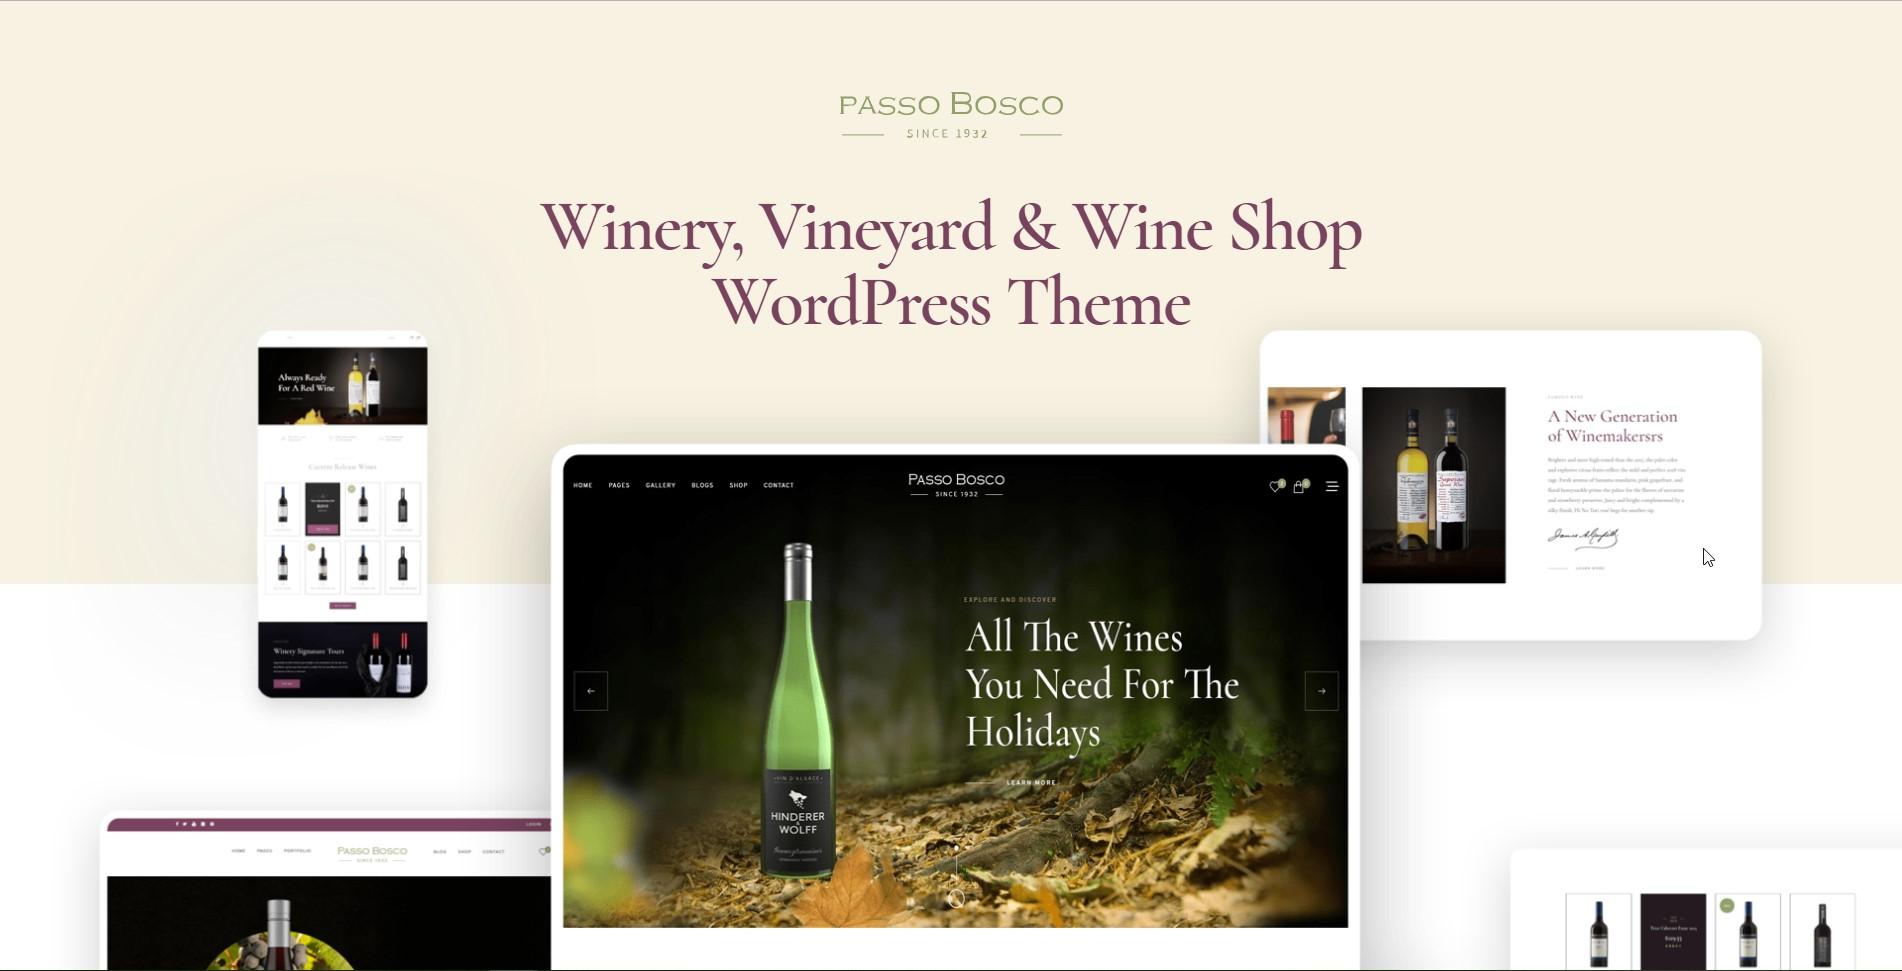 Passo Bosco Wine & Winery WordPress Theme